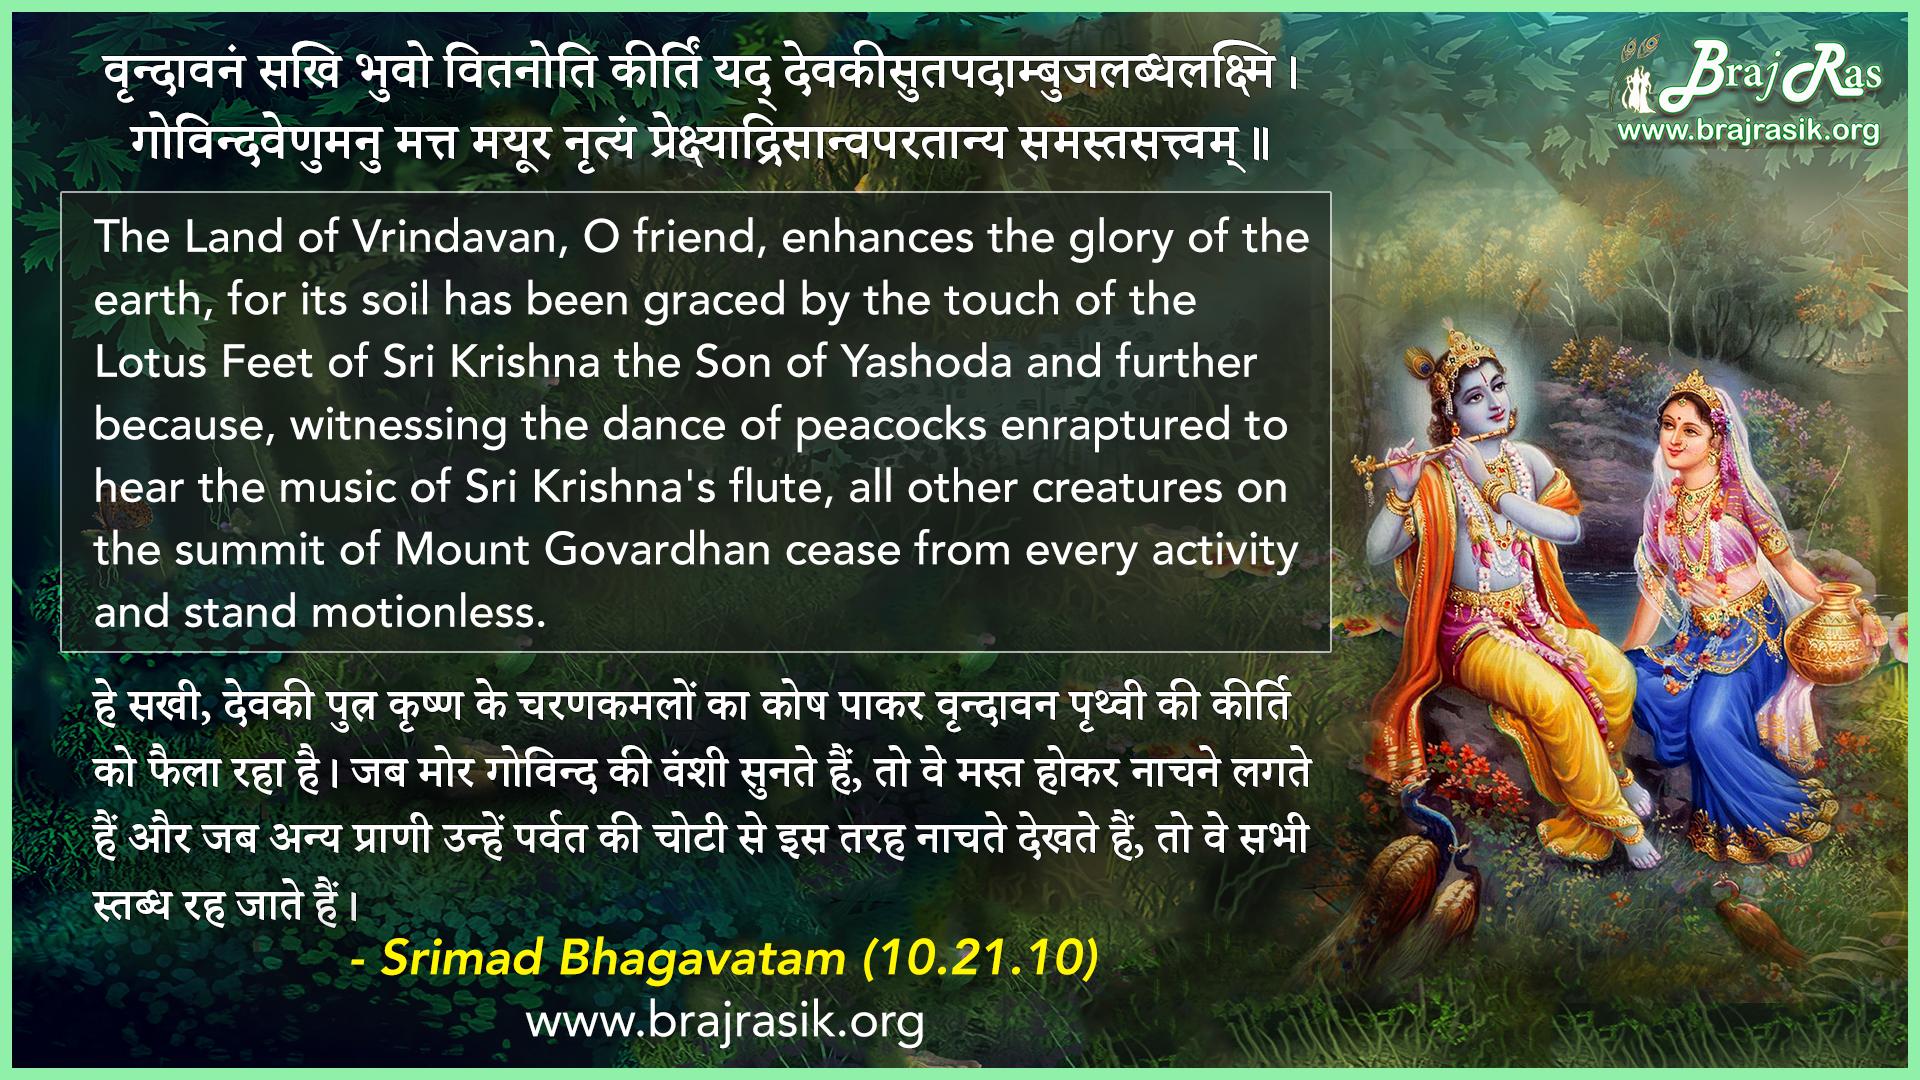 Vrindavanam Sakhi Bhuvo Vitanoti Kirtim - Srimad Bhagavatam (10.21.10)